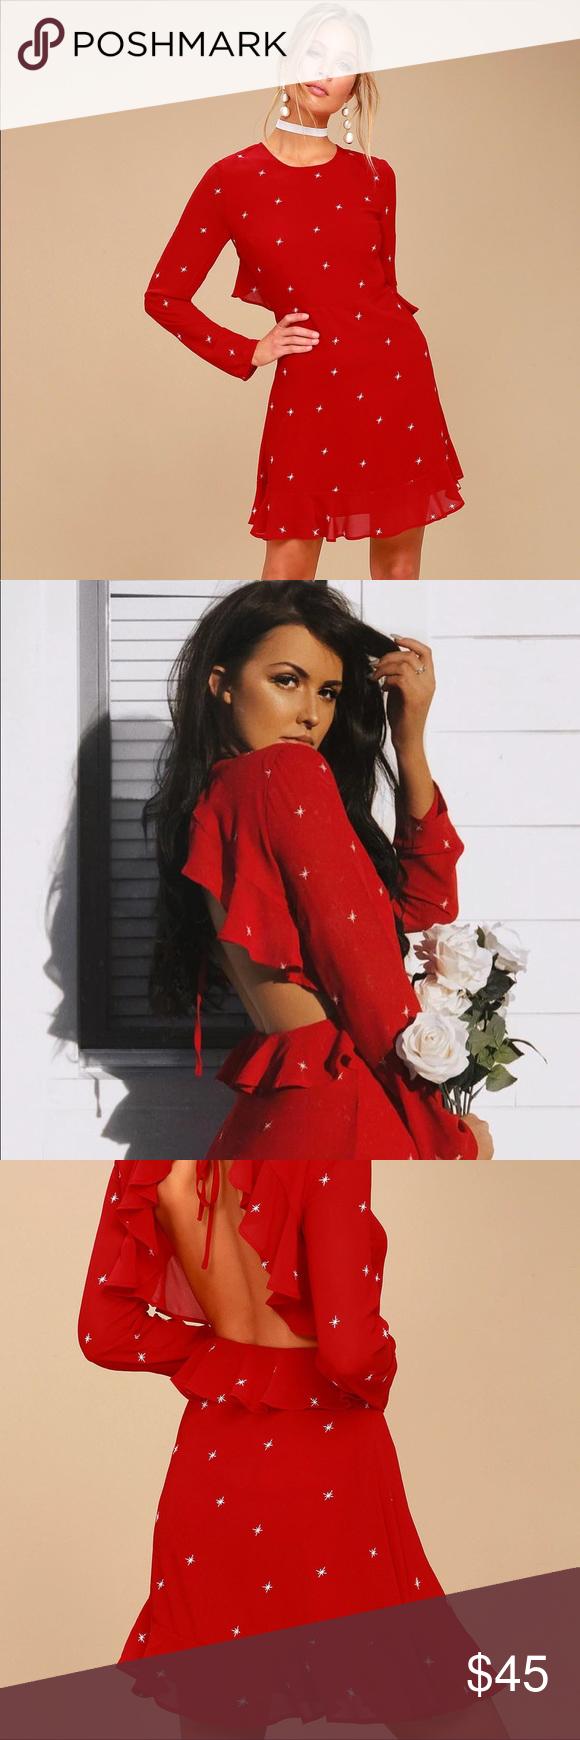 Luluus red constellation backless dress nwt